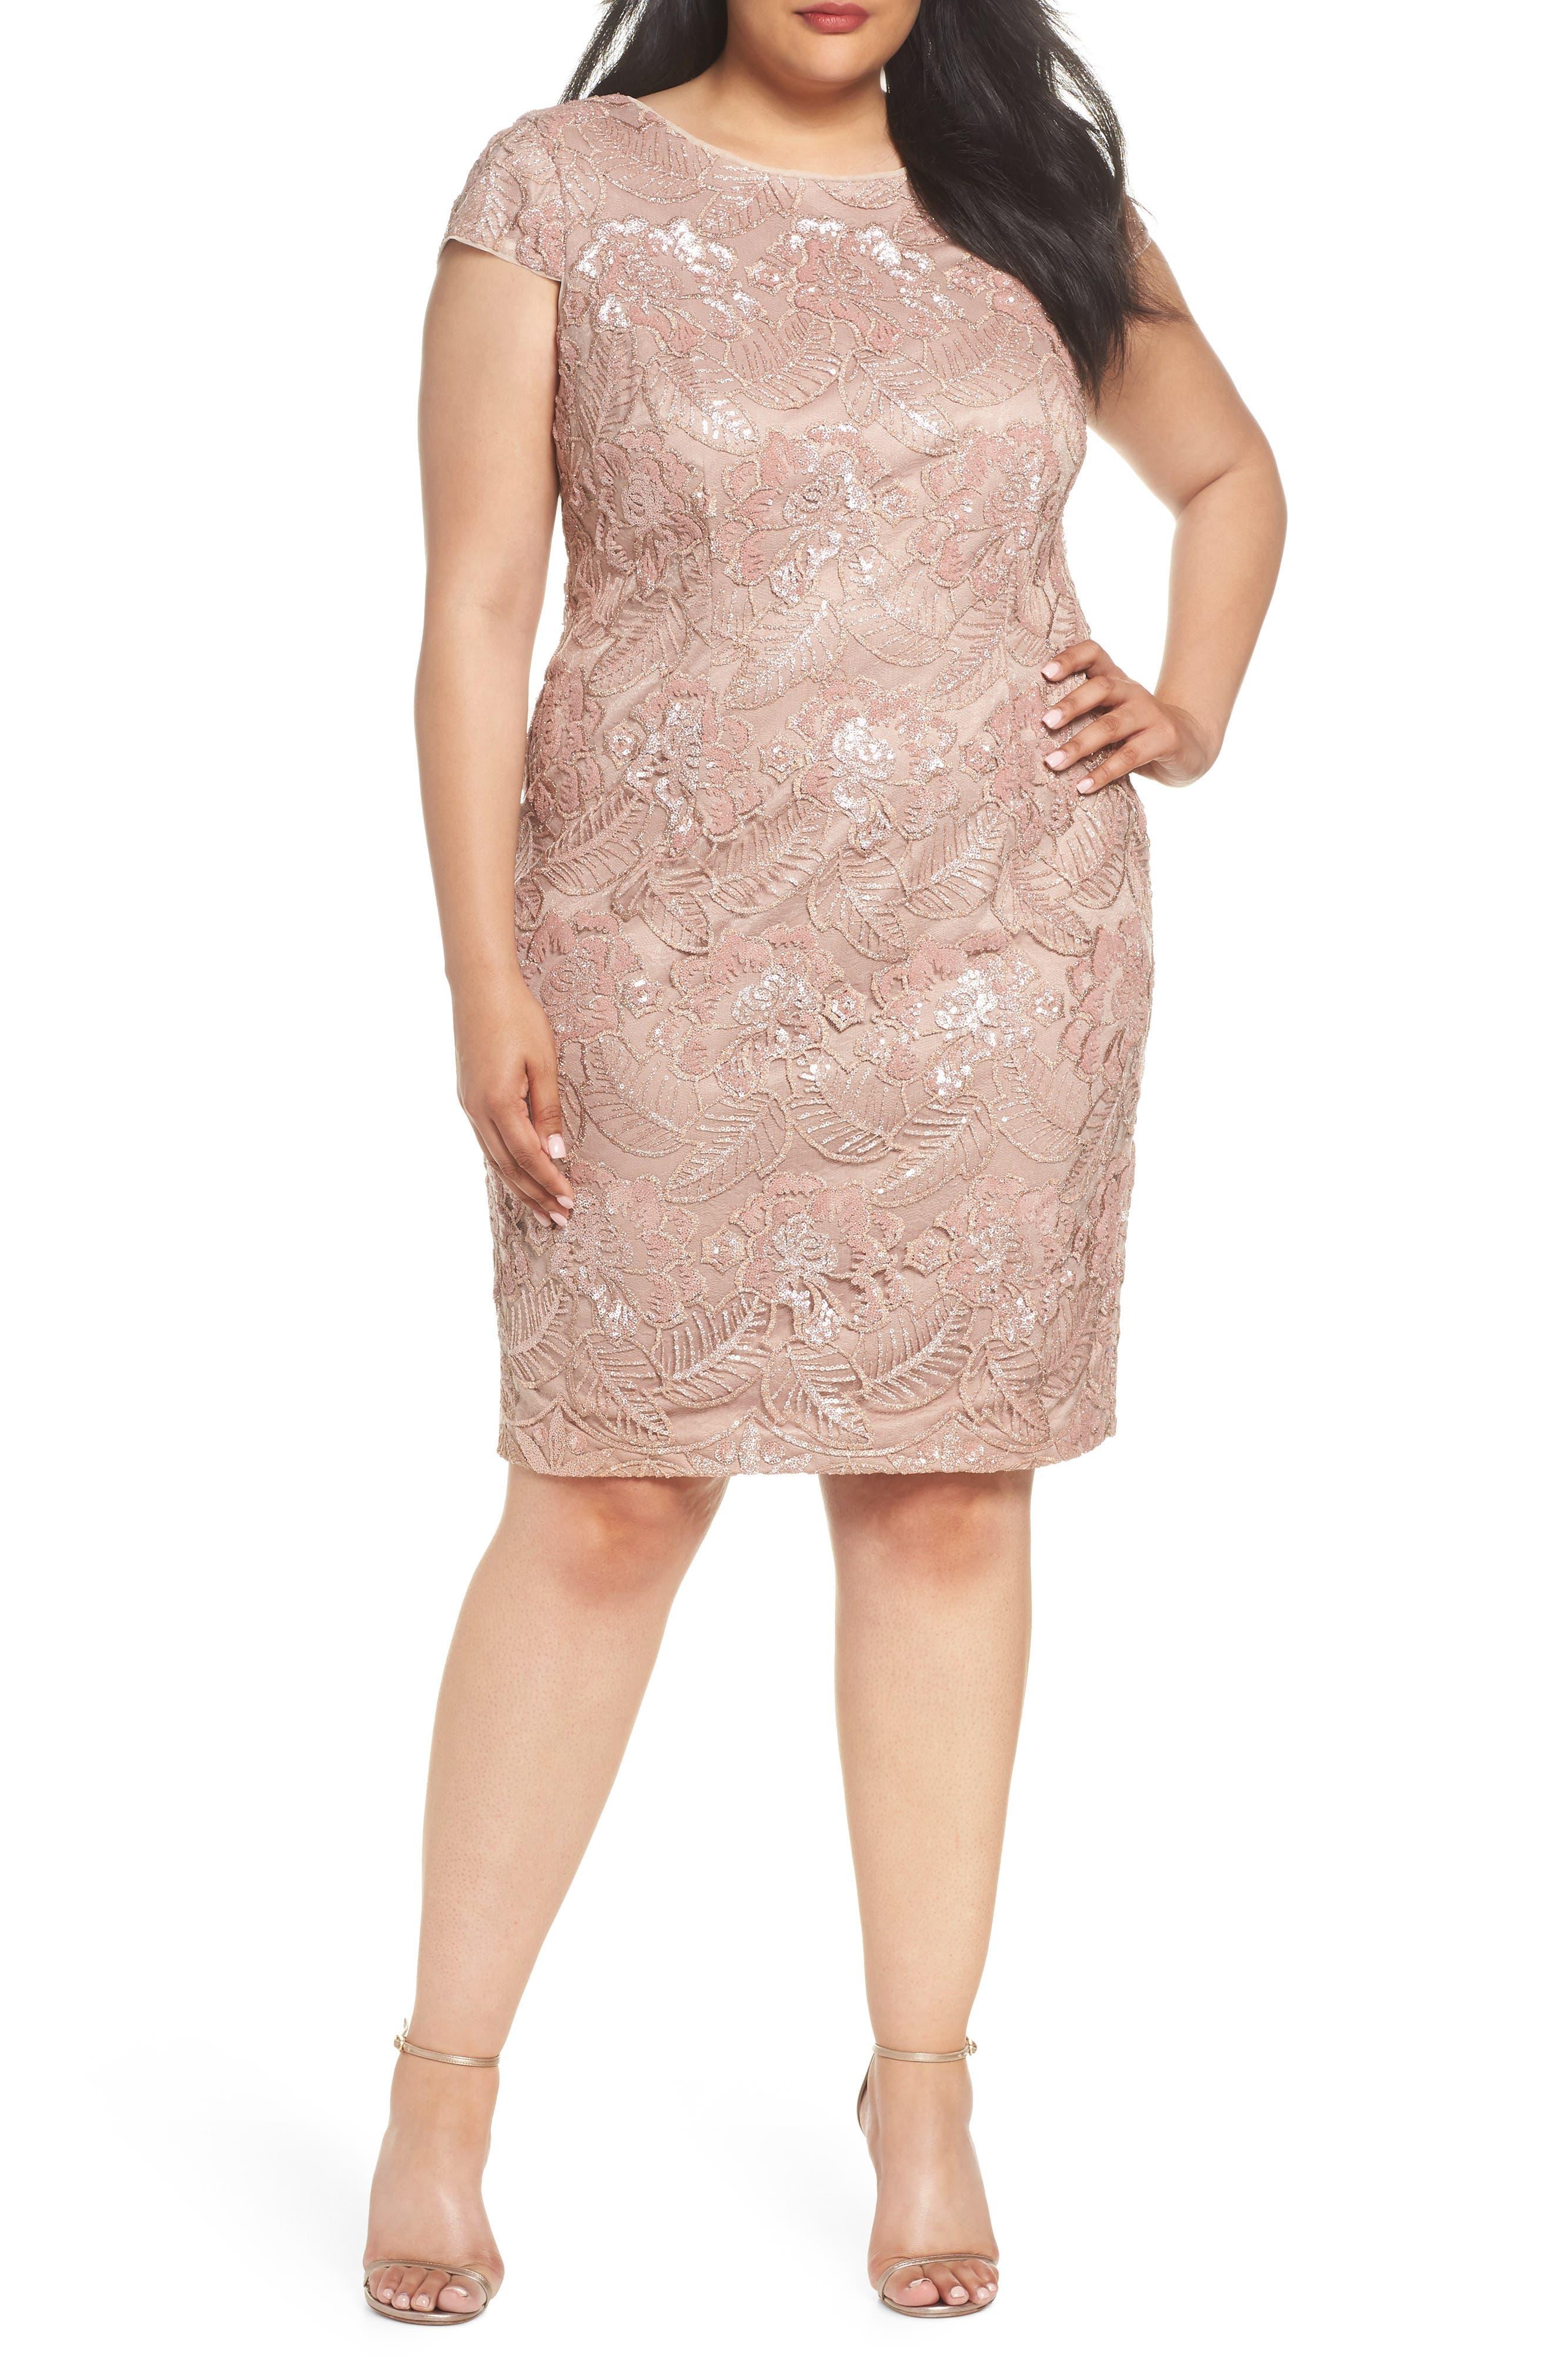 Sequin Lace Cocktail Dress,                             Main thumbnail 1, color,                             ROSE GOLD